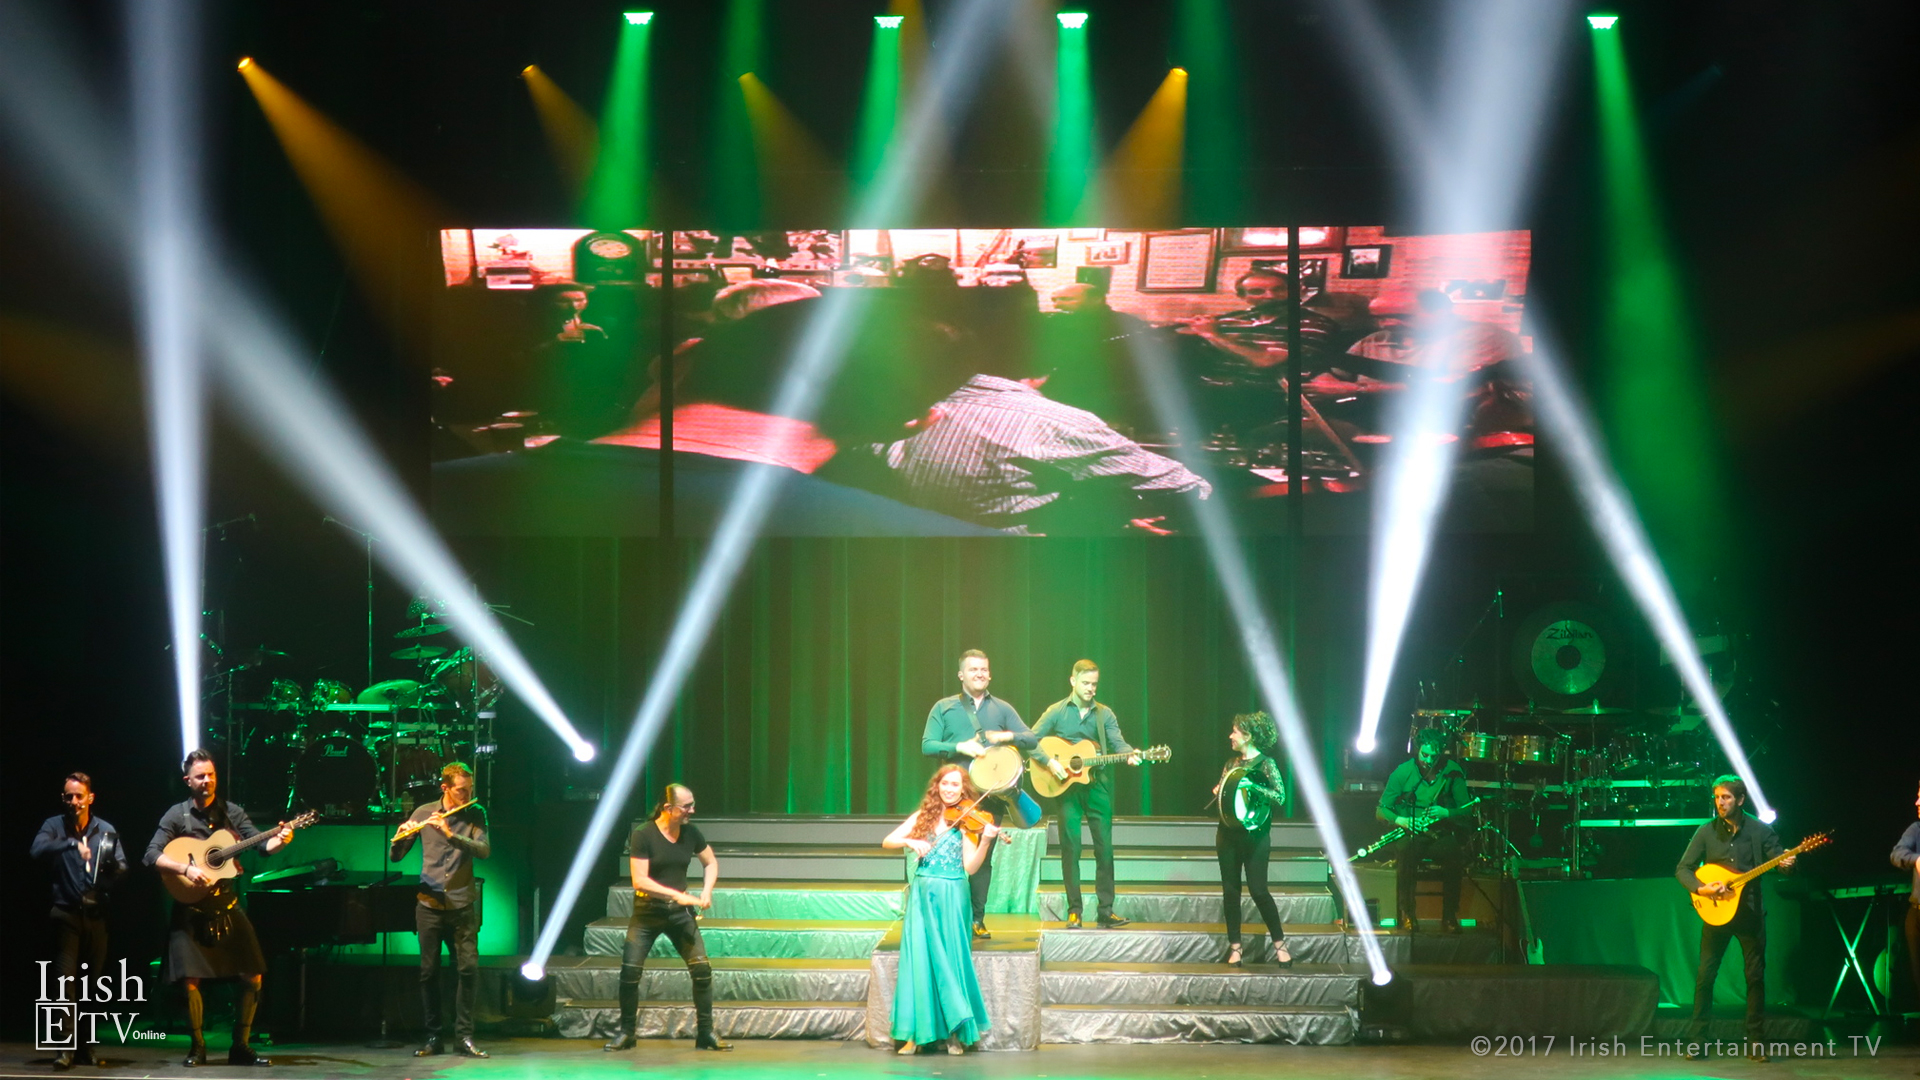 Irish-ETV-Celtic-Woman-Full-Stage.jpg